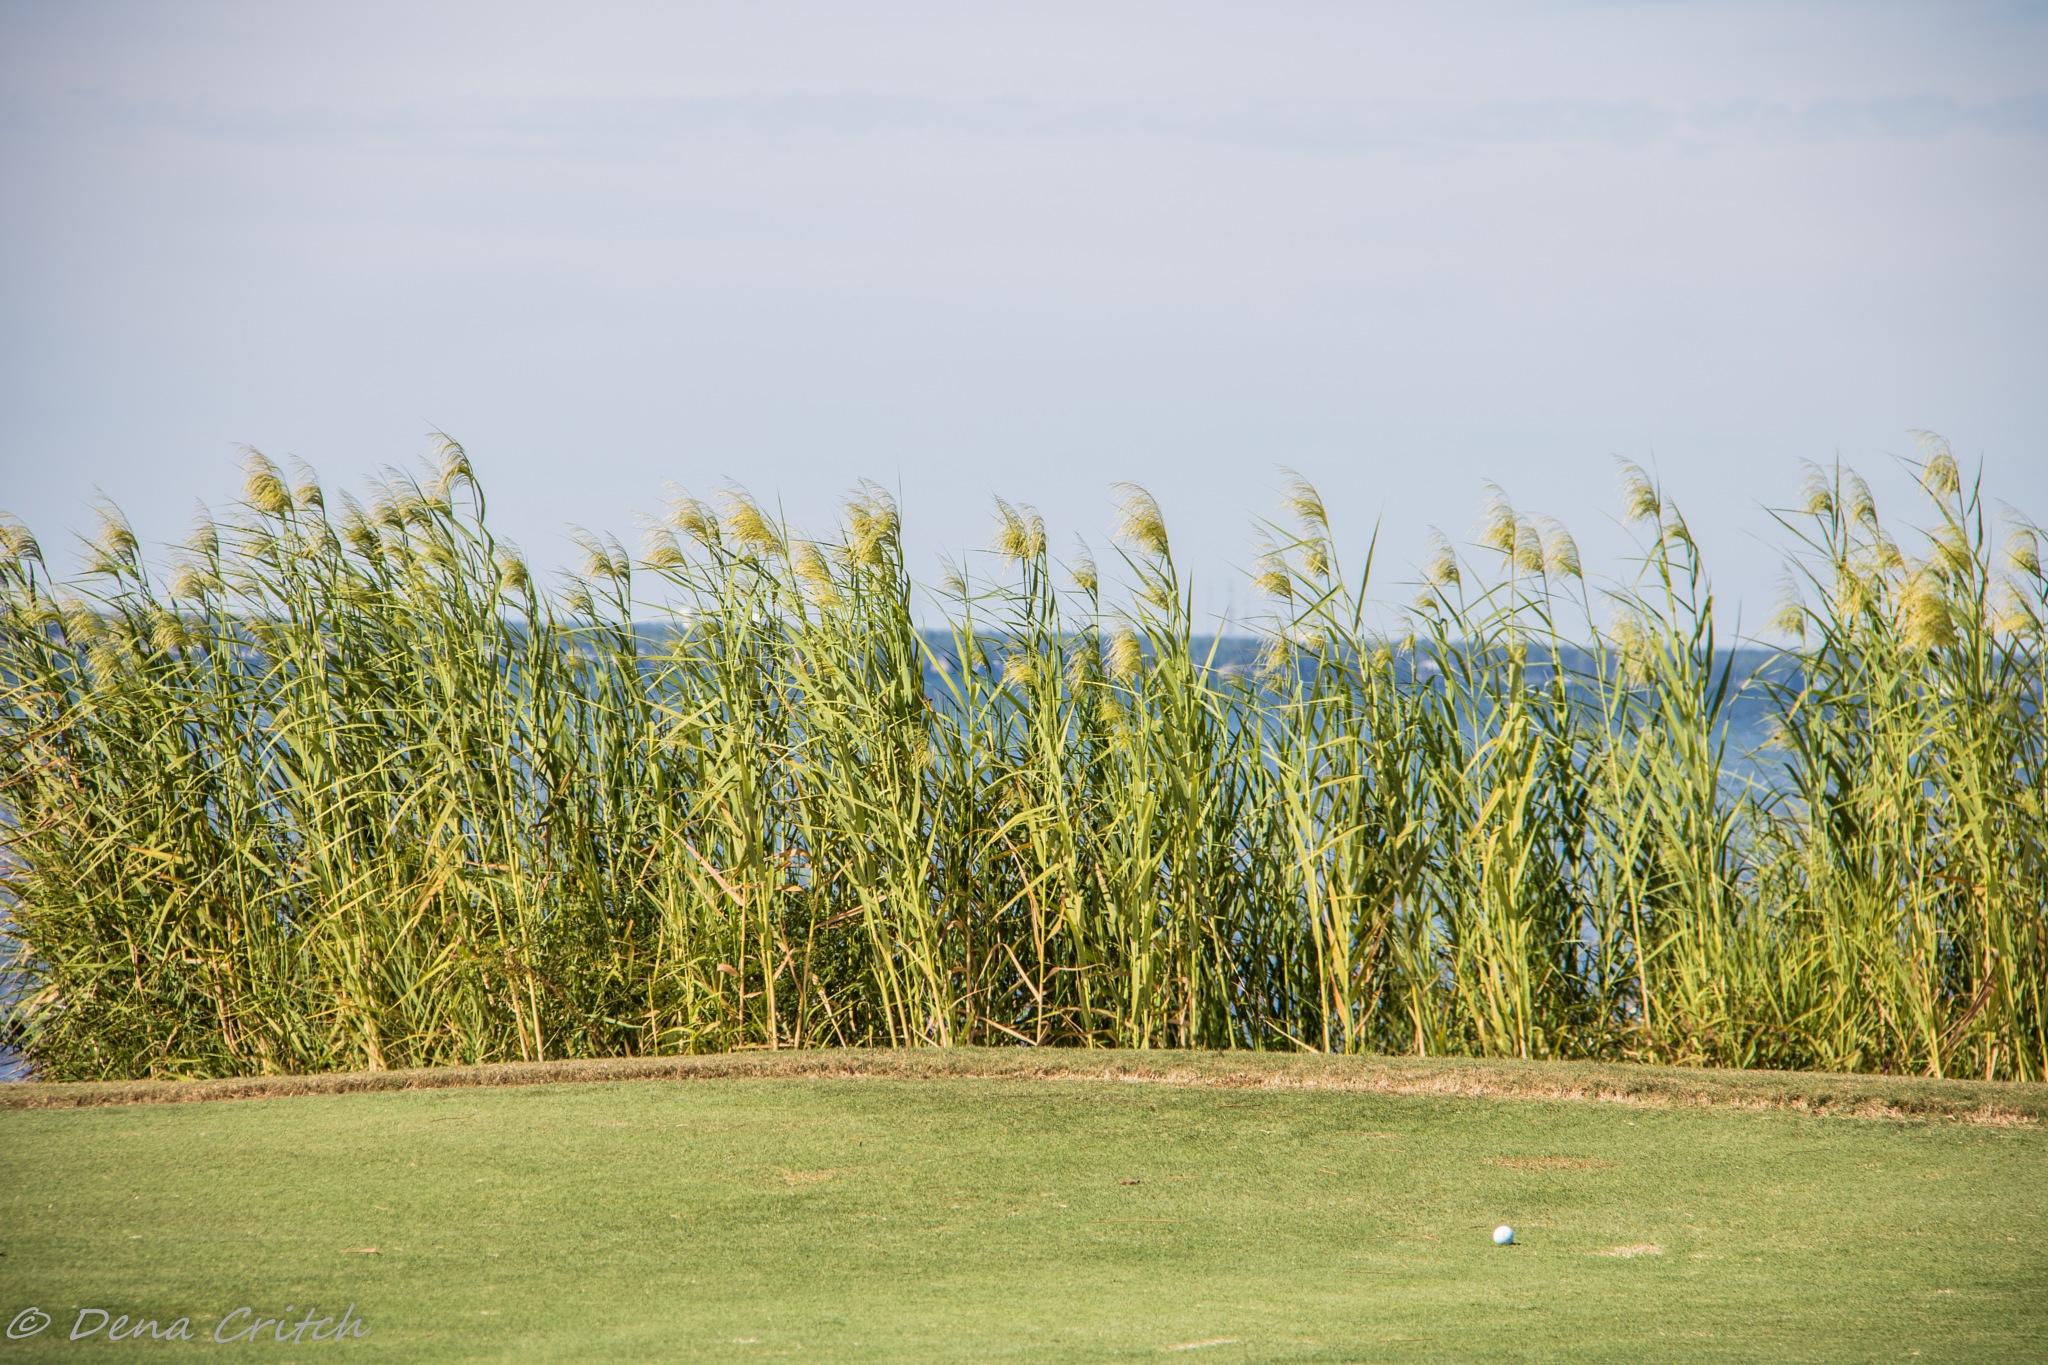 A 'Sea' of Grass by dena.critch